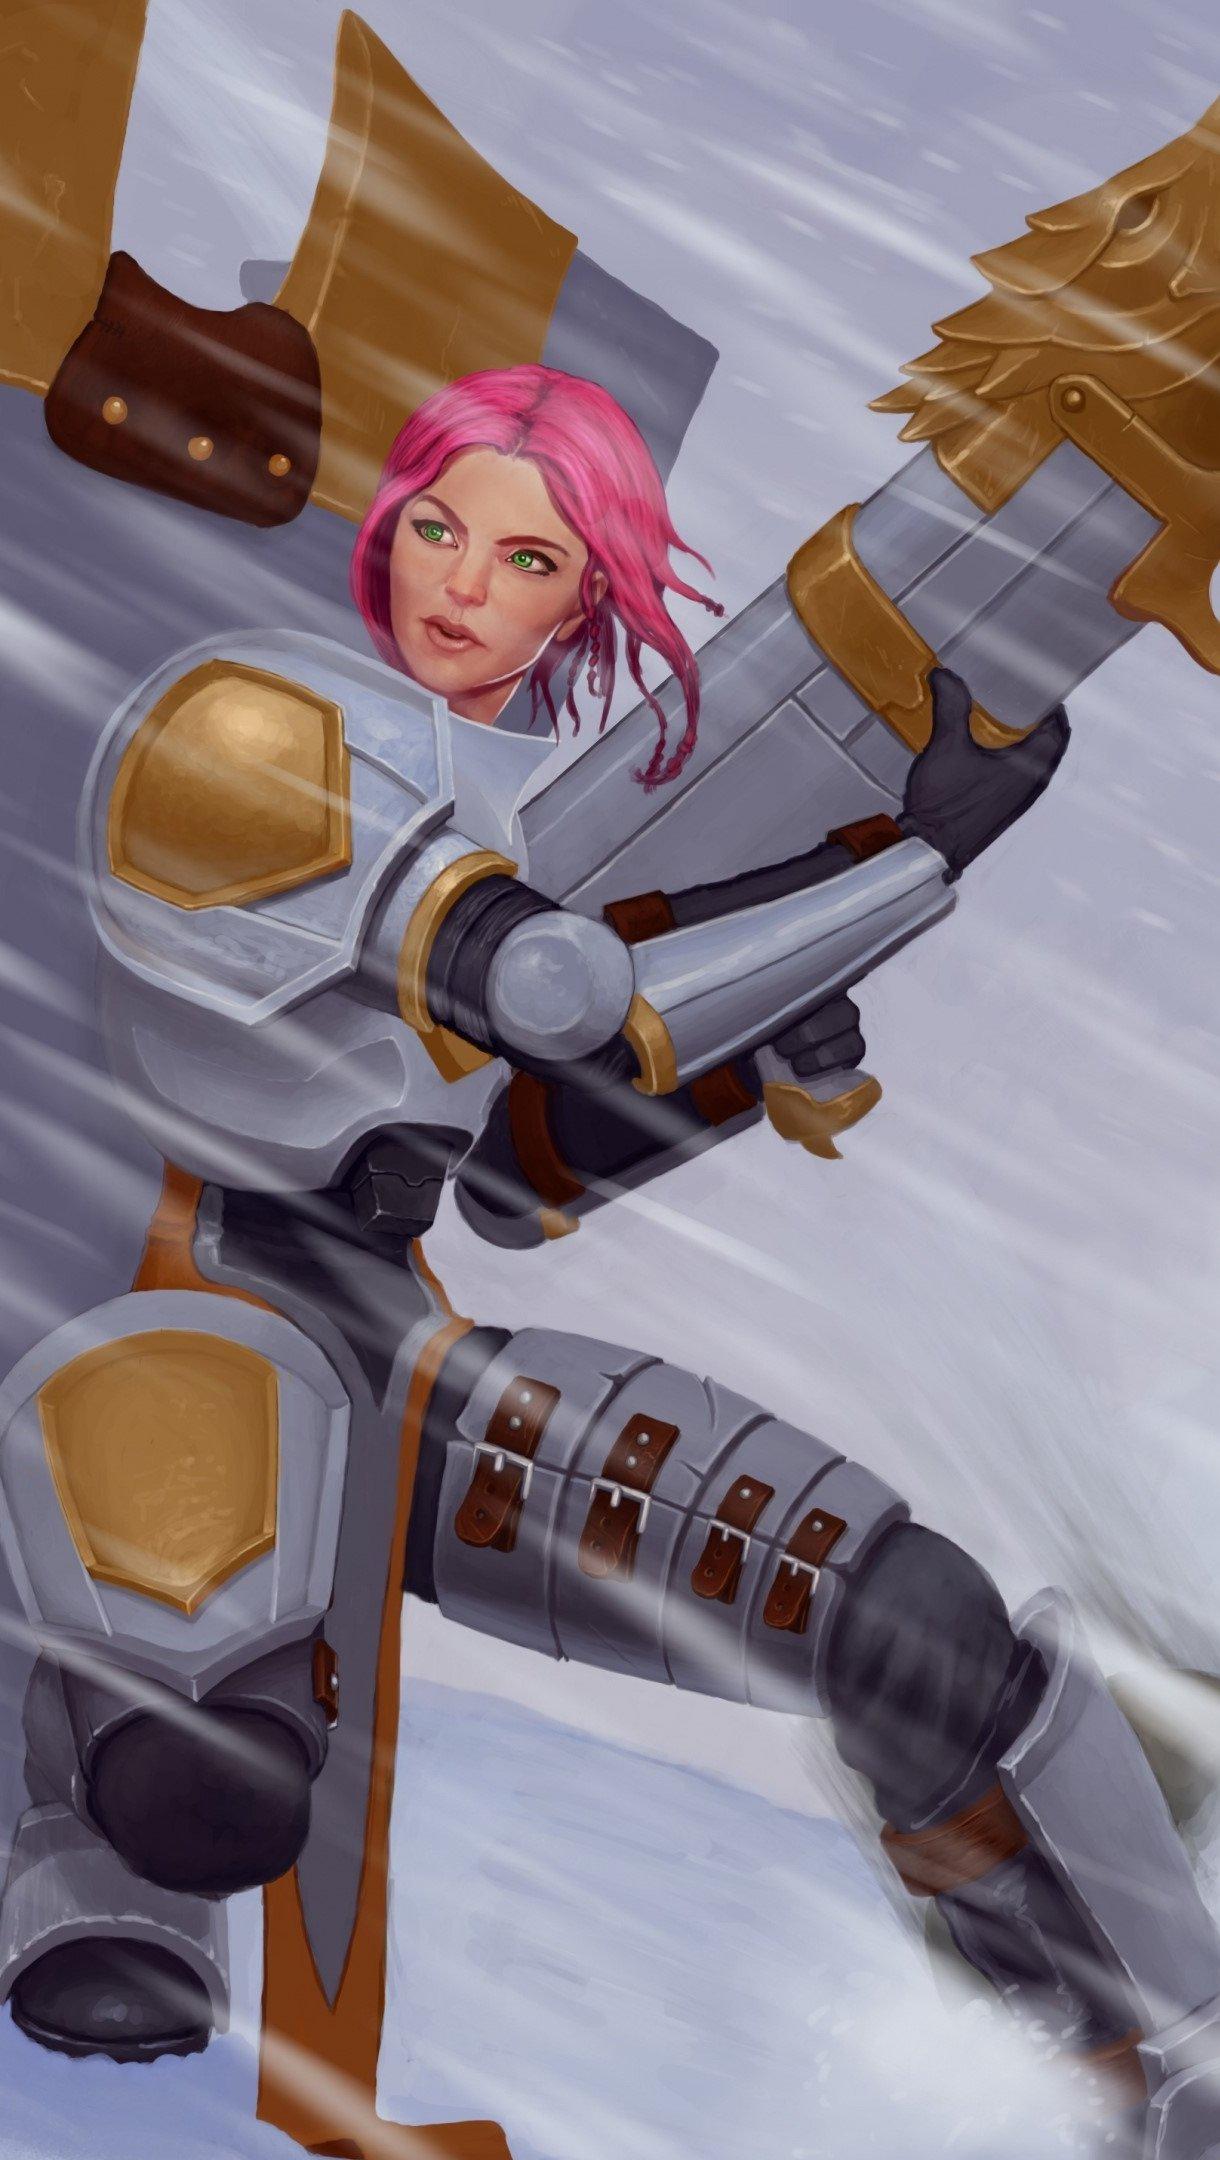 Fondos de pantalla Piltover Enforcer de League of Lengends Vertical